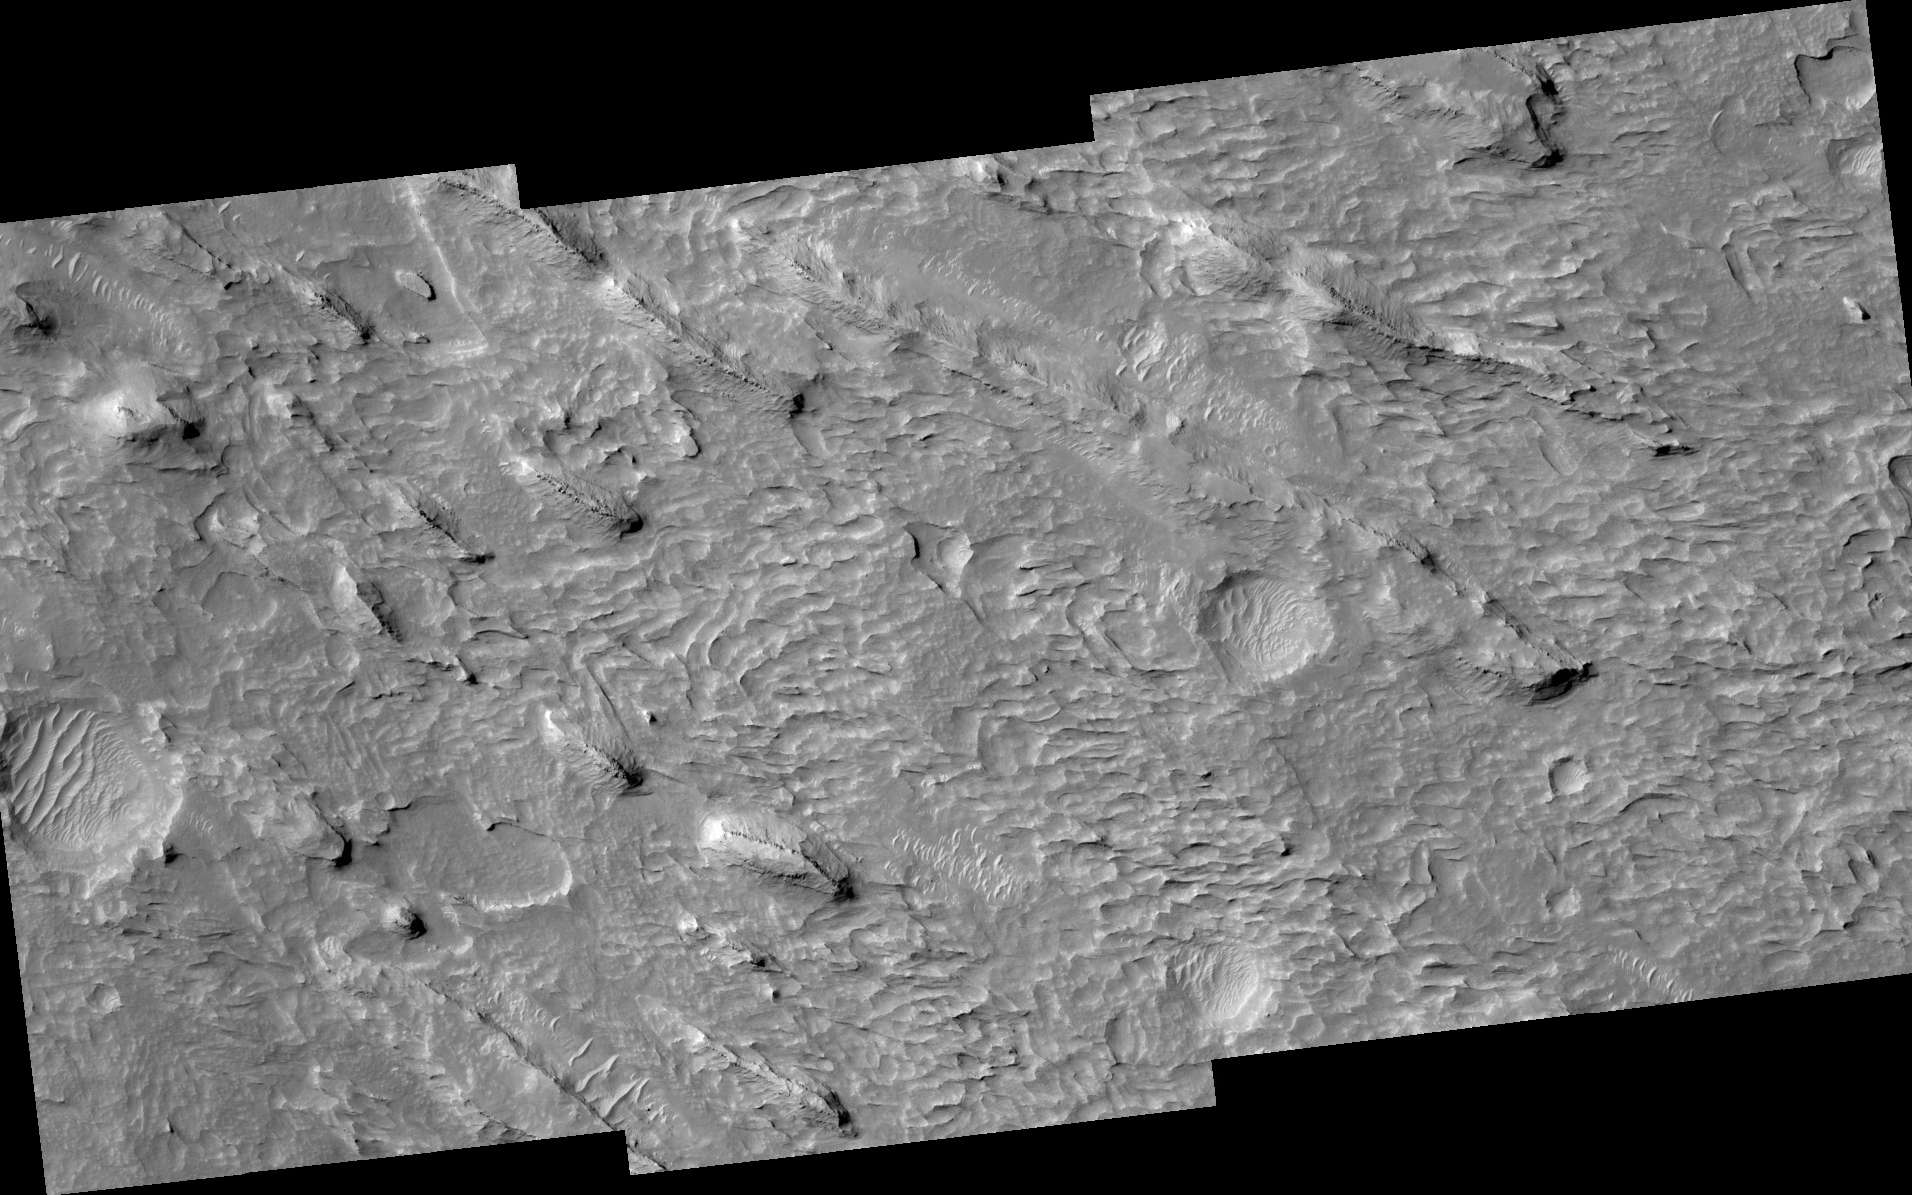 Yardangs dans la formation de Medusae Fossae. Photo de la sonde Mars Reconnaissance Orbiter. © Nasa, JPL, University of Arizona